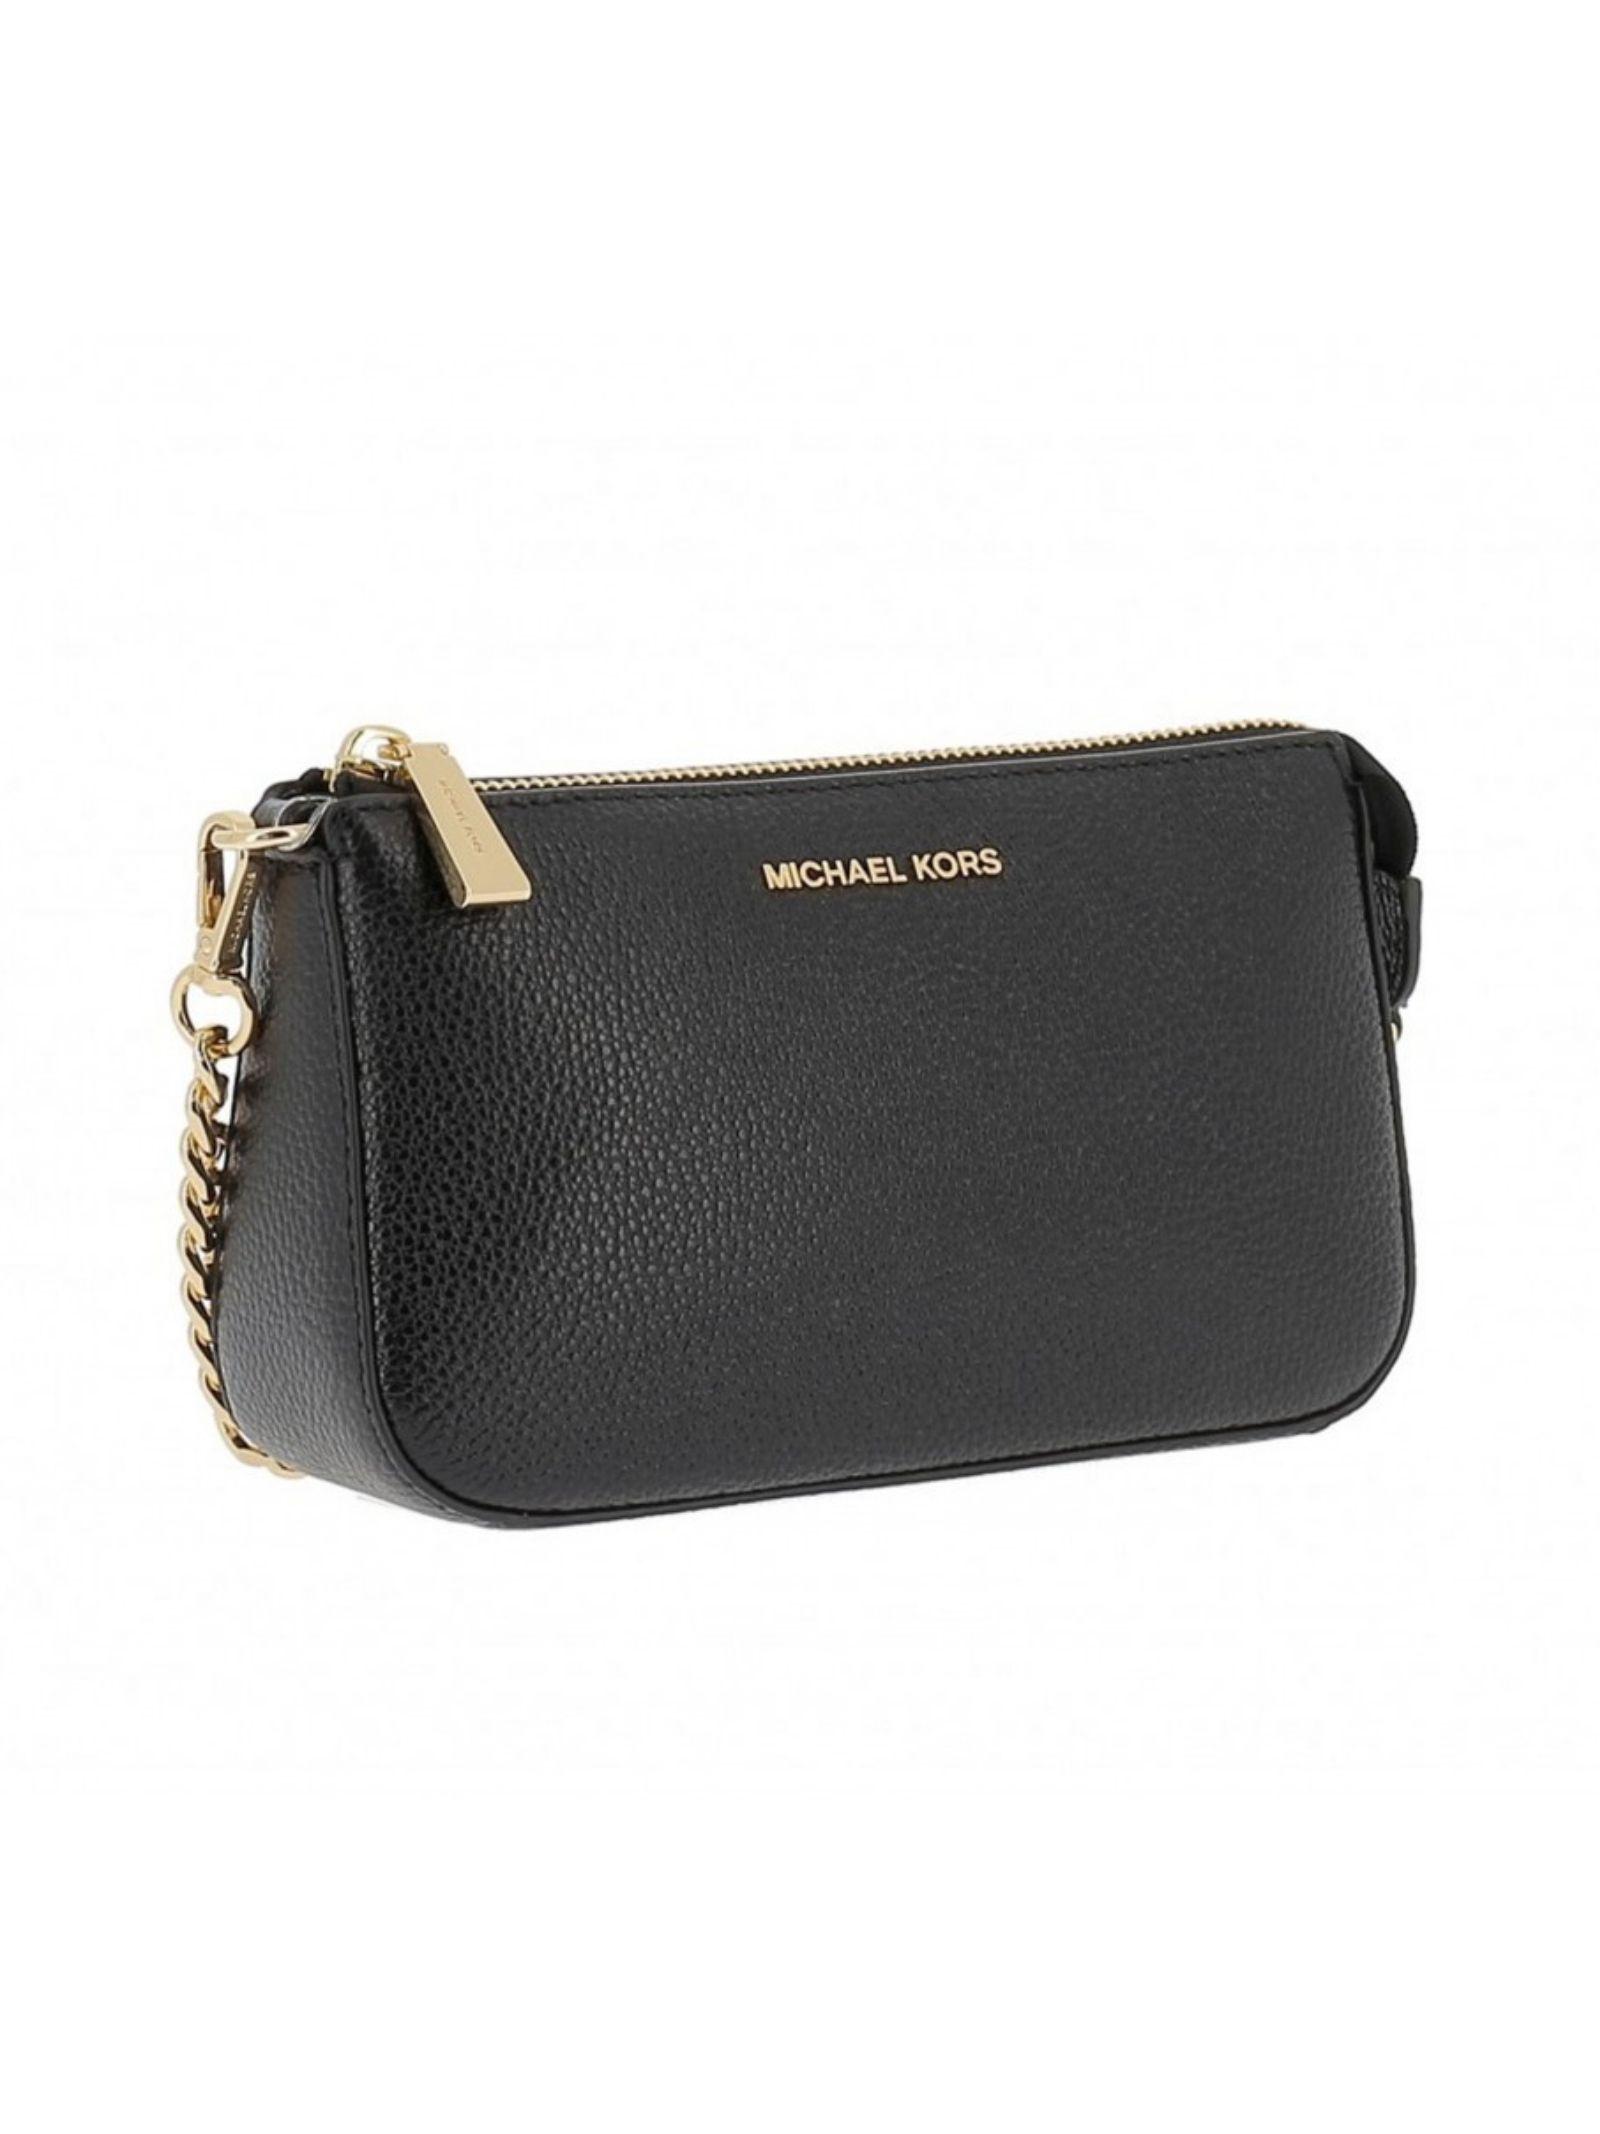 MICHAEL KORS   Handbag   32F7GFDW6L001